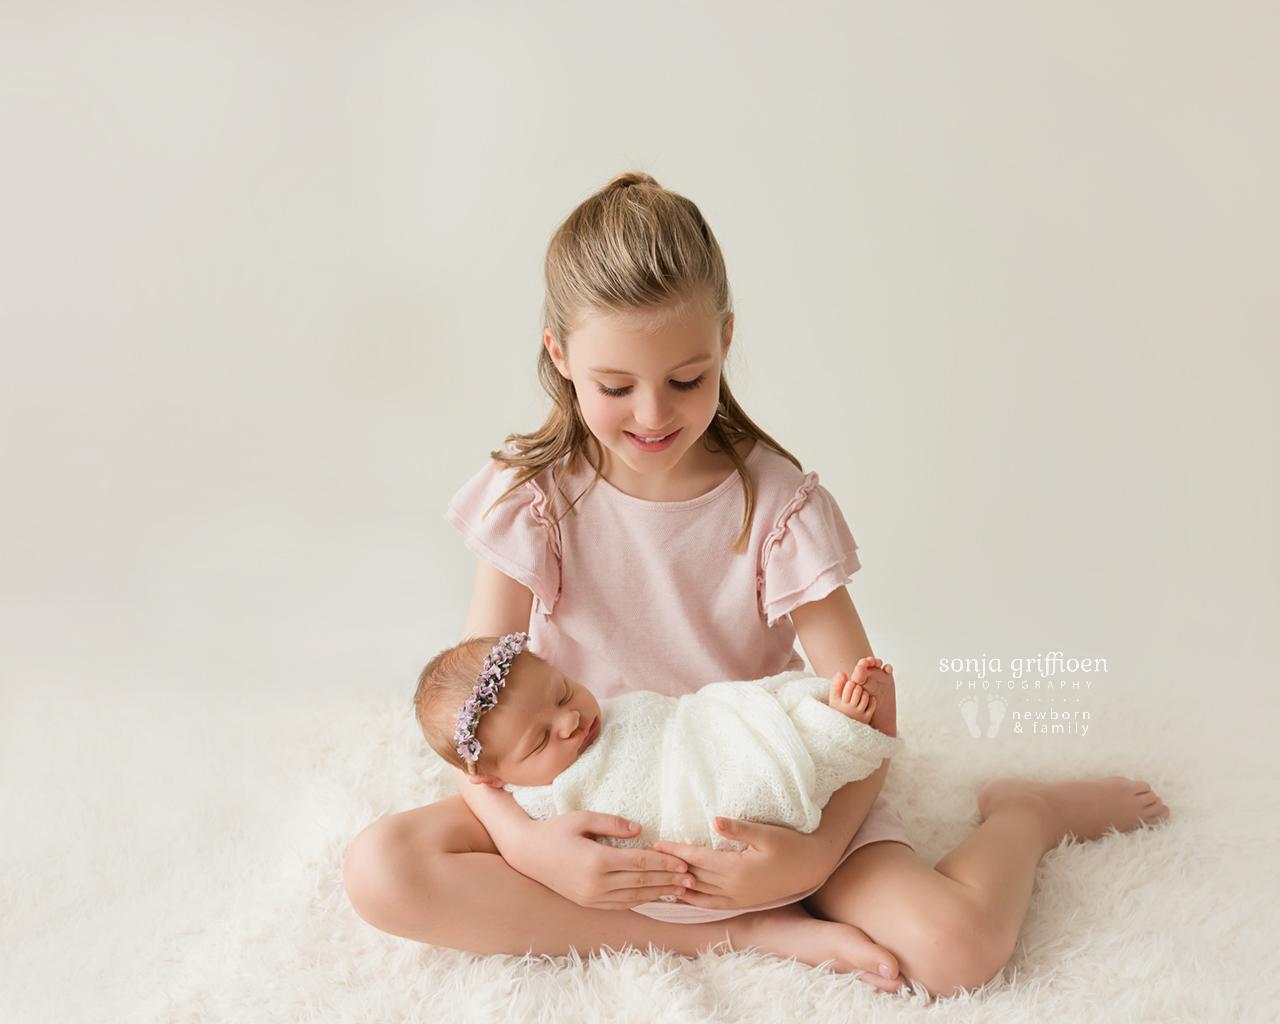 Petra-Newborn-Brisbane-Newborn-Photographer-Sonja-Griffioen-01.jpg